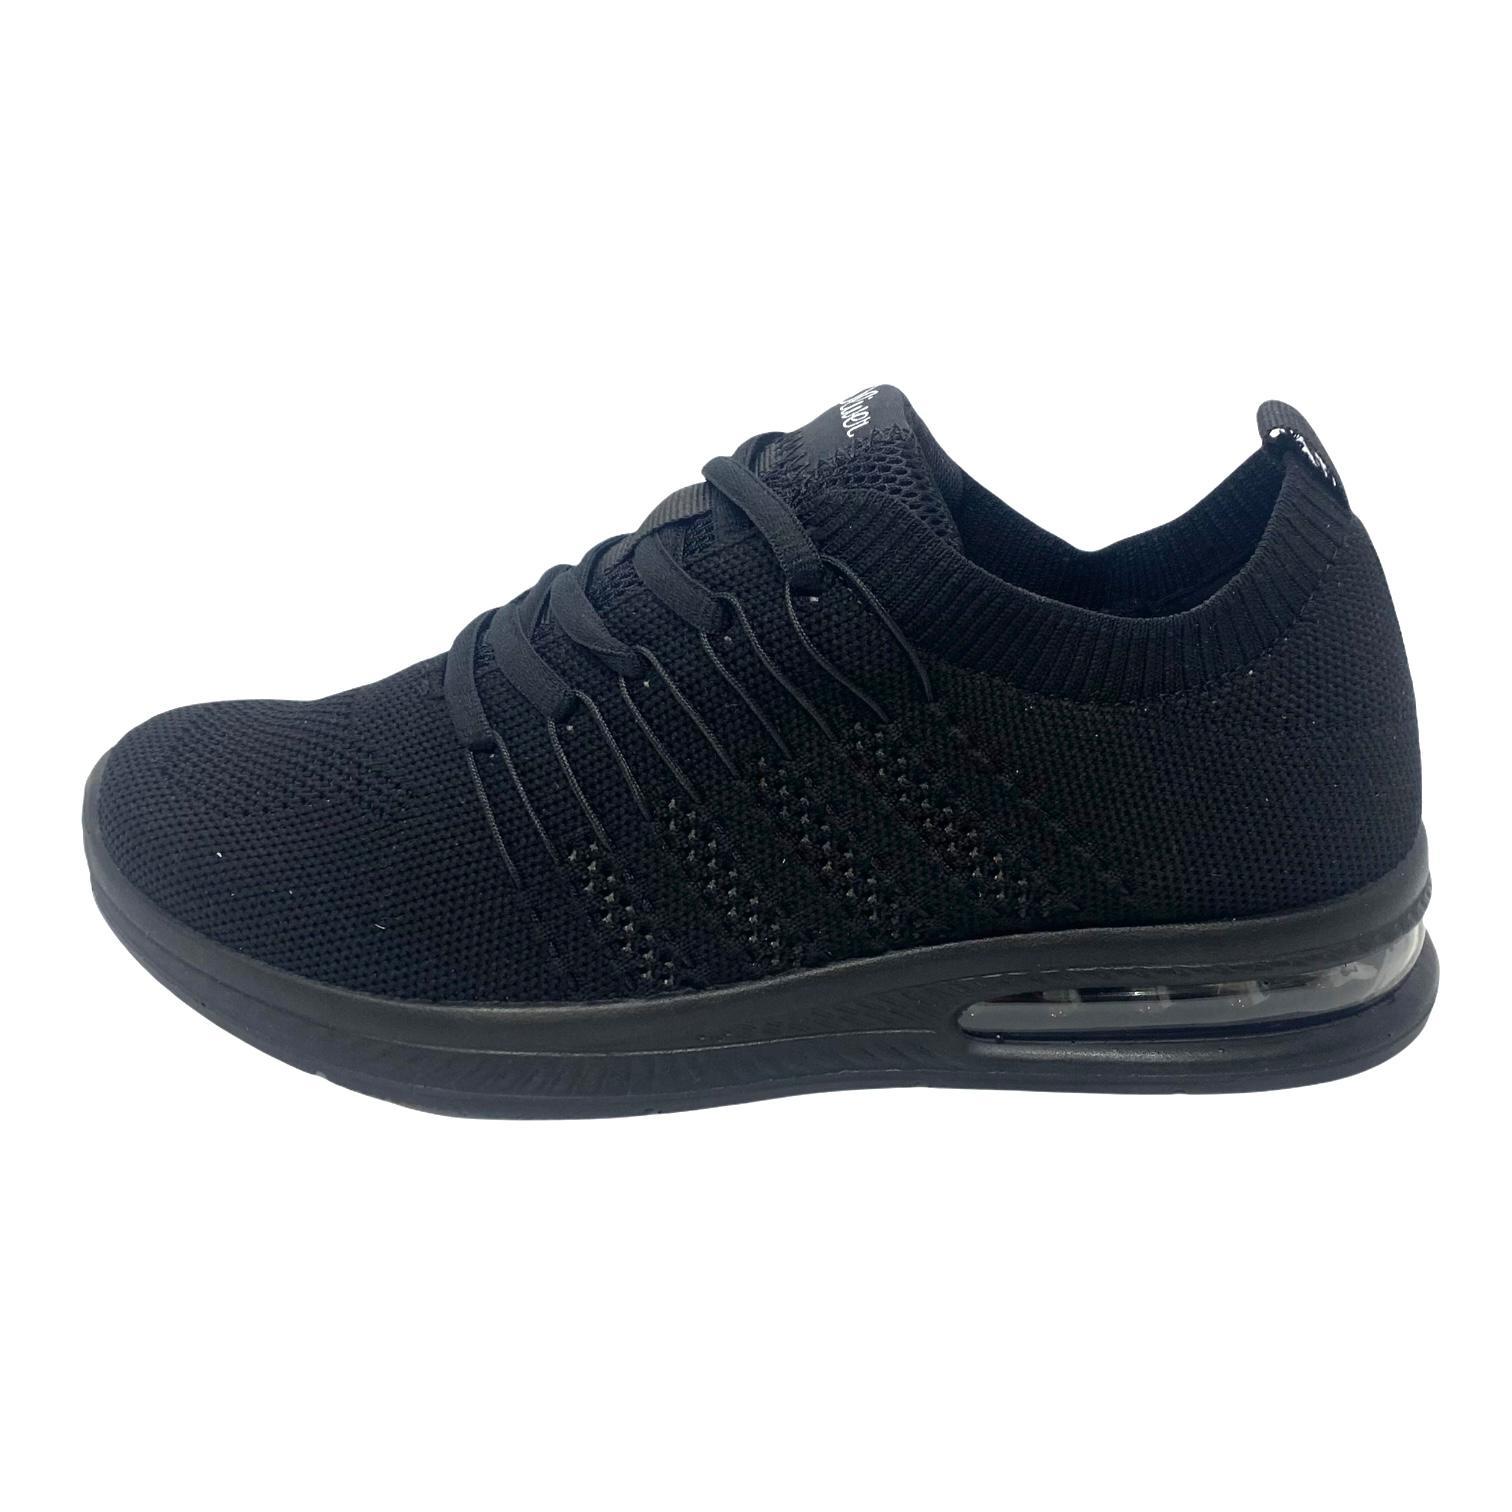 Pantofi s.Oliver sport slip-on negri